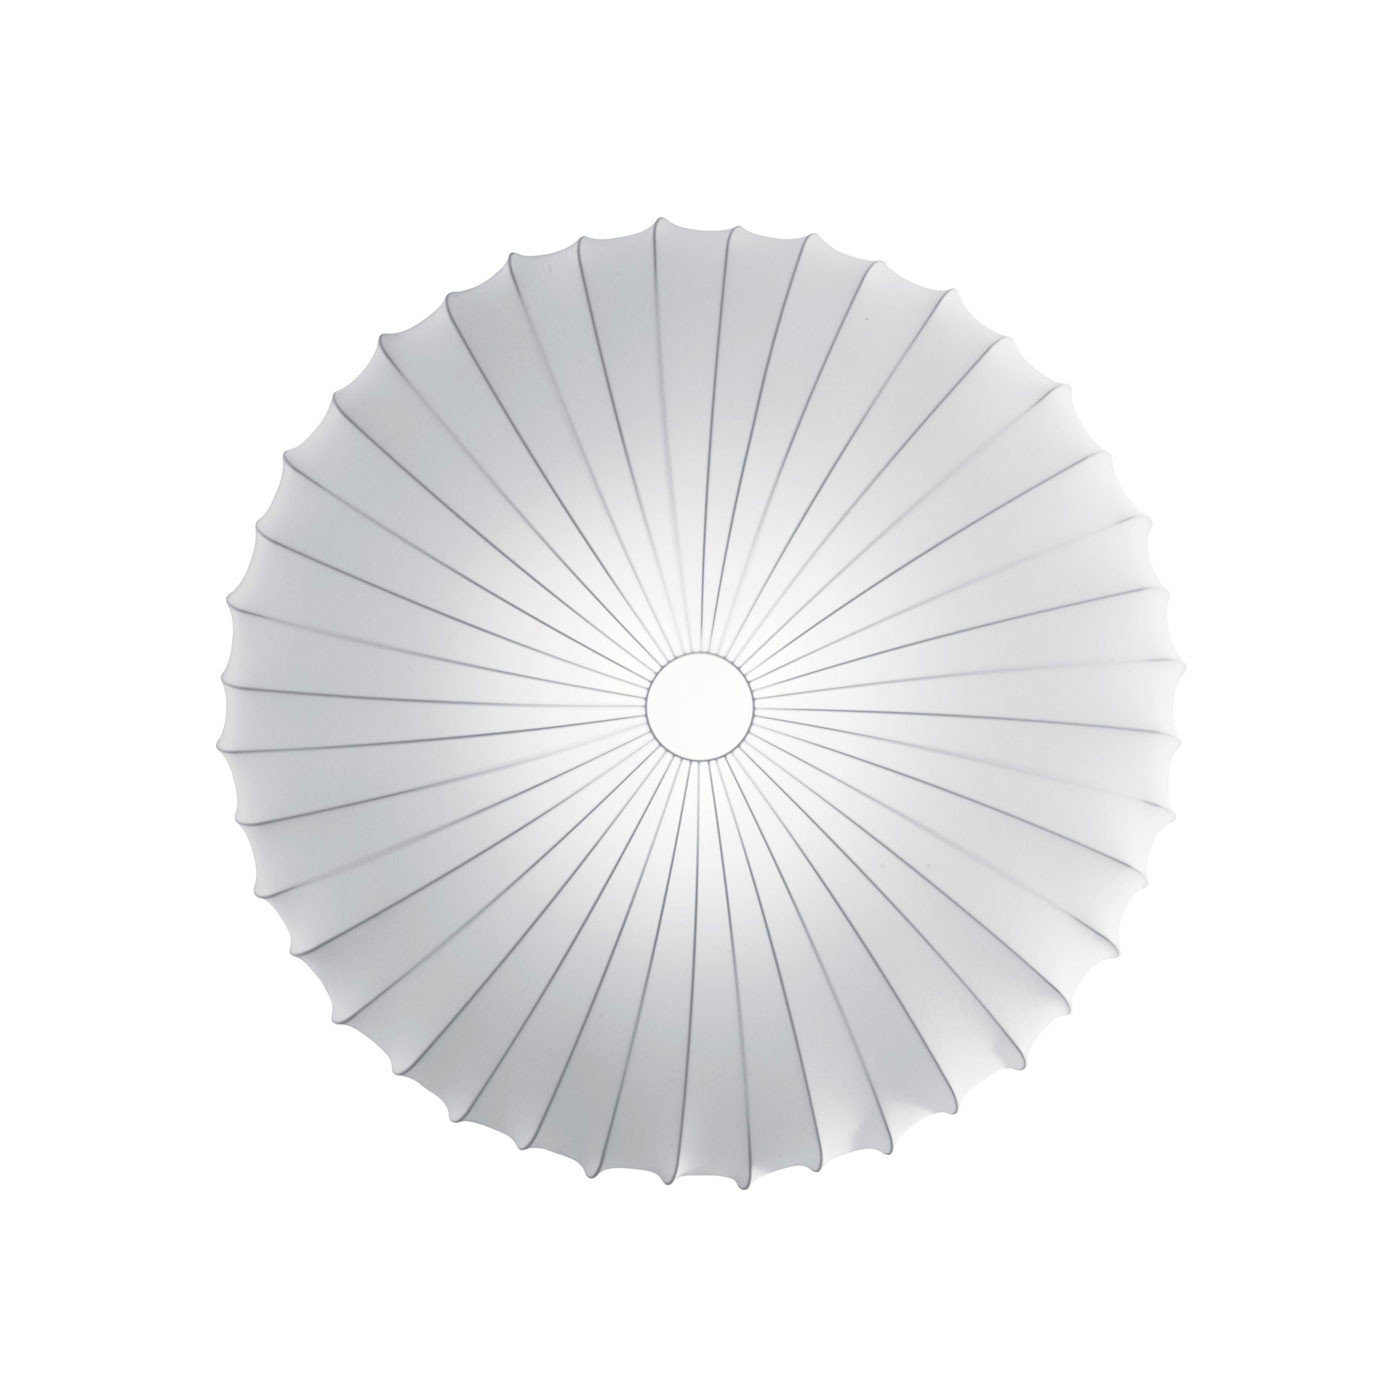 Axo Light Muse PL60